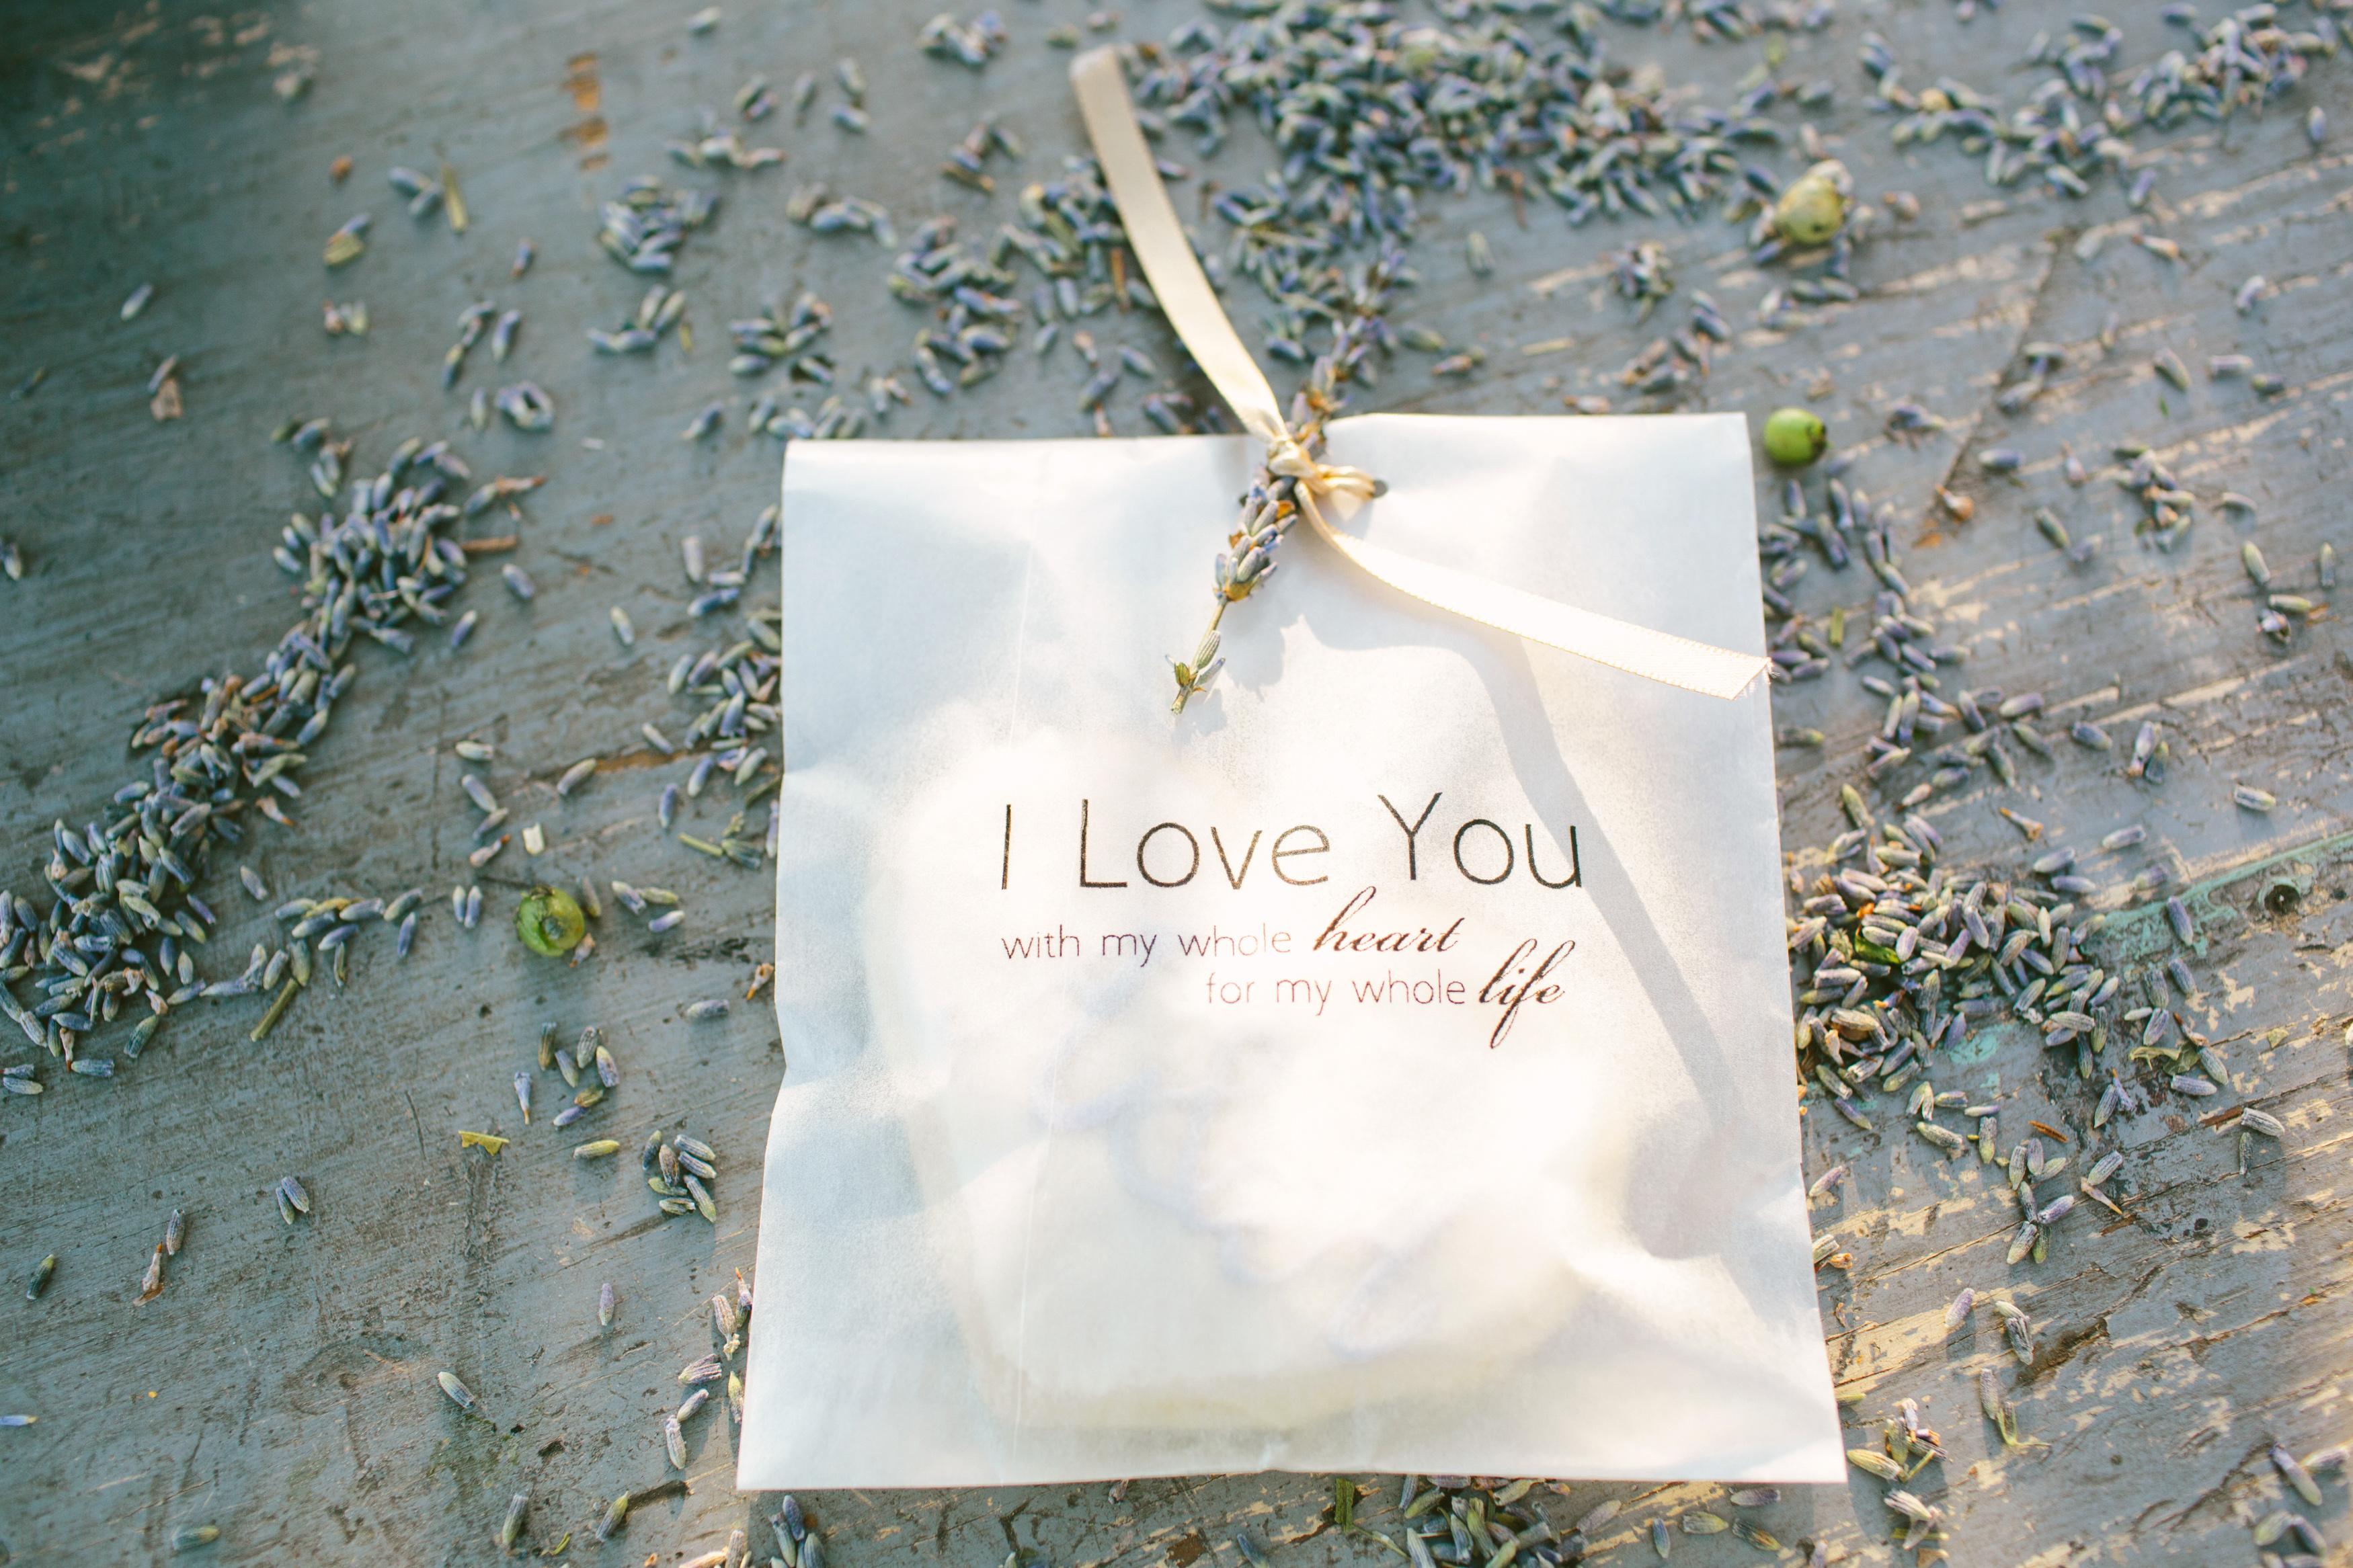 Montage Laguna Beach, Destination Wedding Planner, Beach Wedding, Vis Photography | A Good Affair Wedding & Event Production